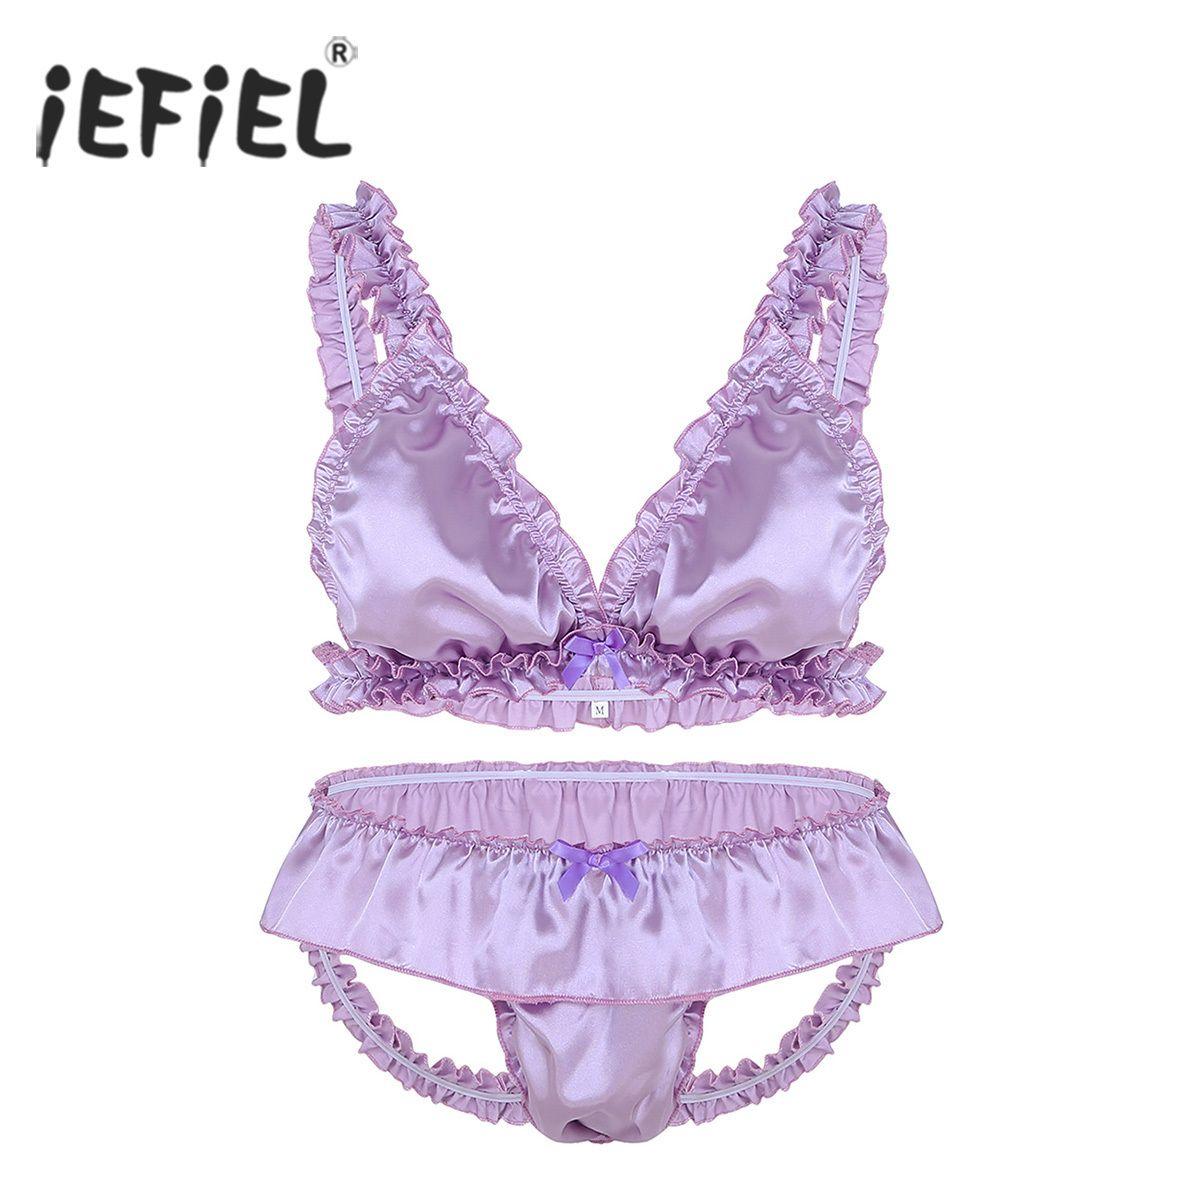 Male Briefs Underwear Knickers Sissy Briefs Elastic Underwear Lingerie